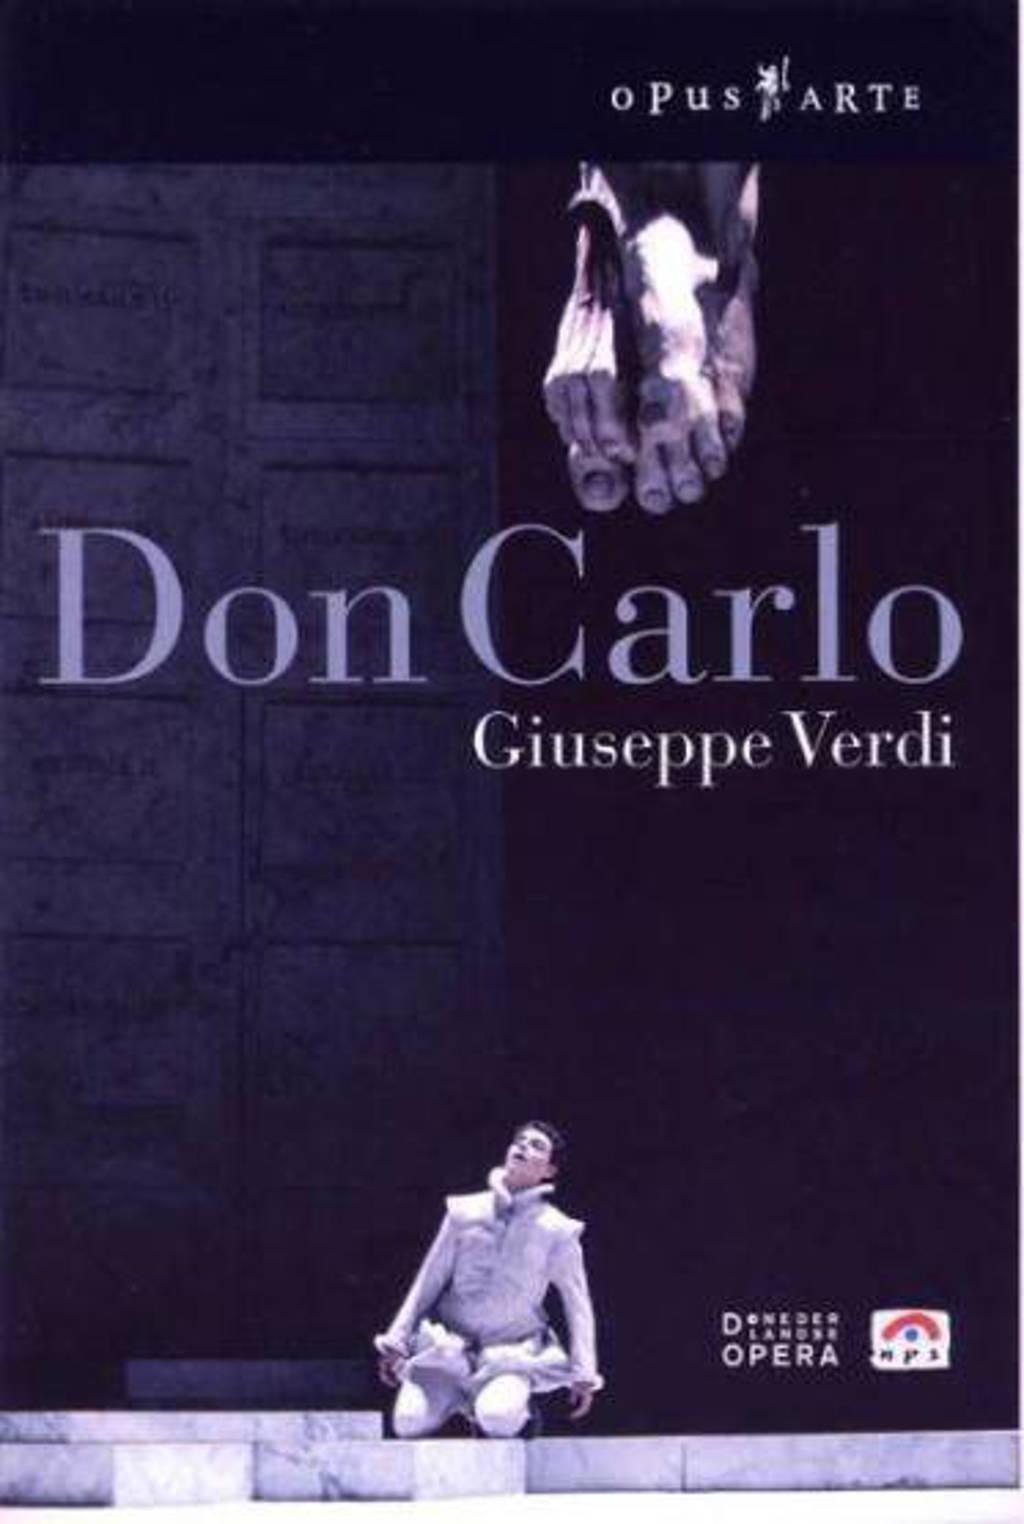 Lloyd/Villazon/Croft/Royal Concertg - Don Carlo (DVD)